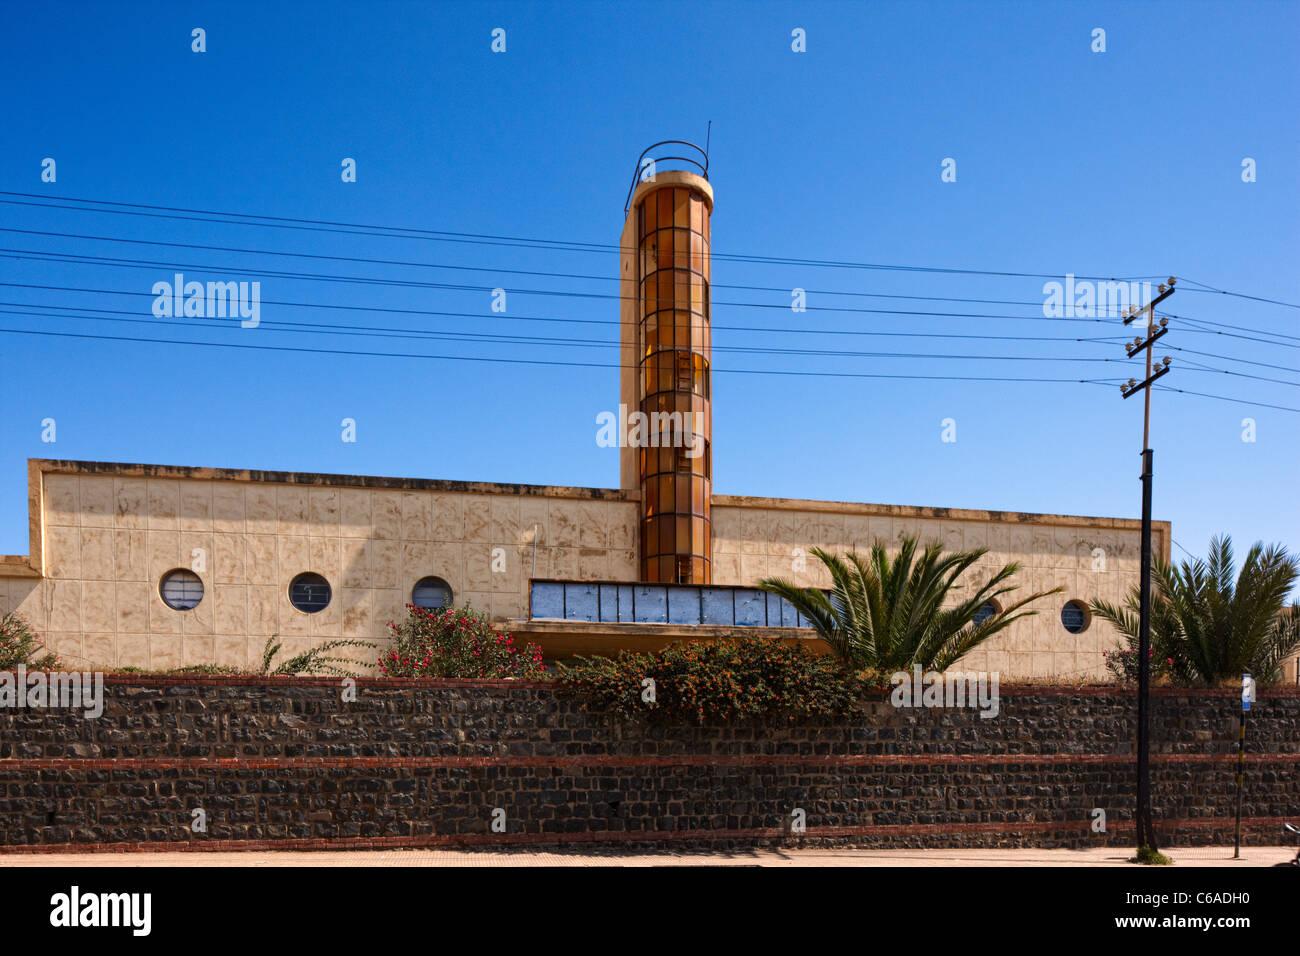 Former Lancia Workshop, Asmara, Eritrea, Africa - Stock Image